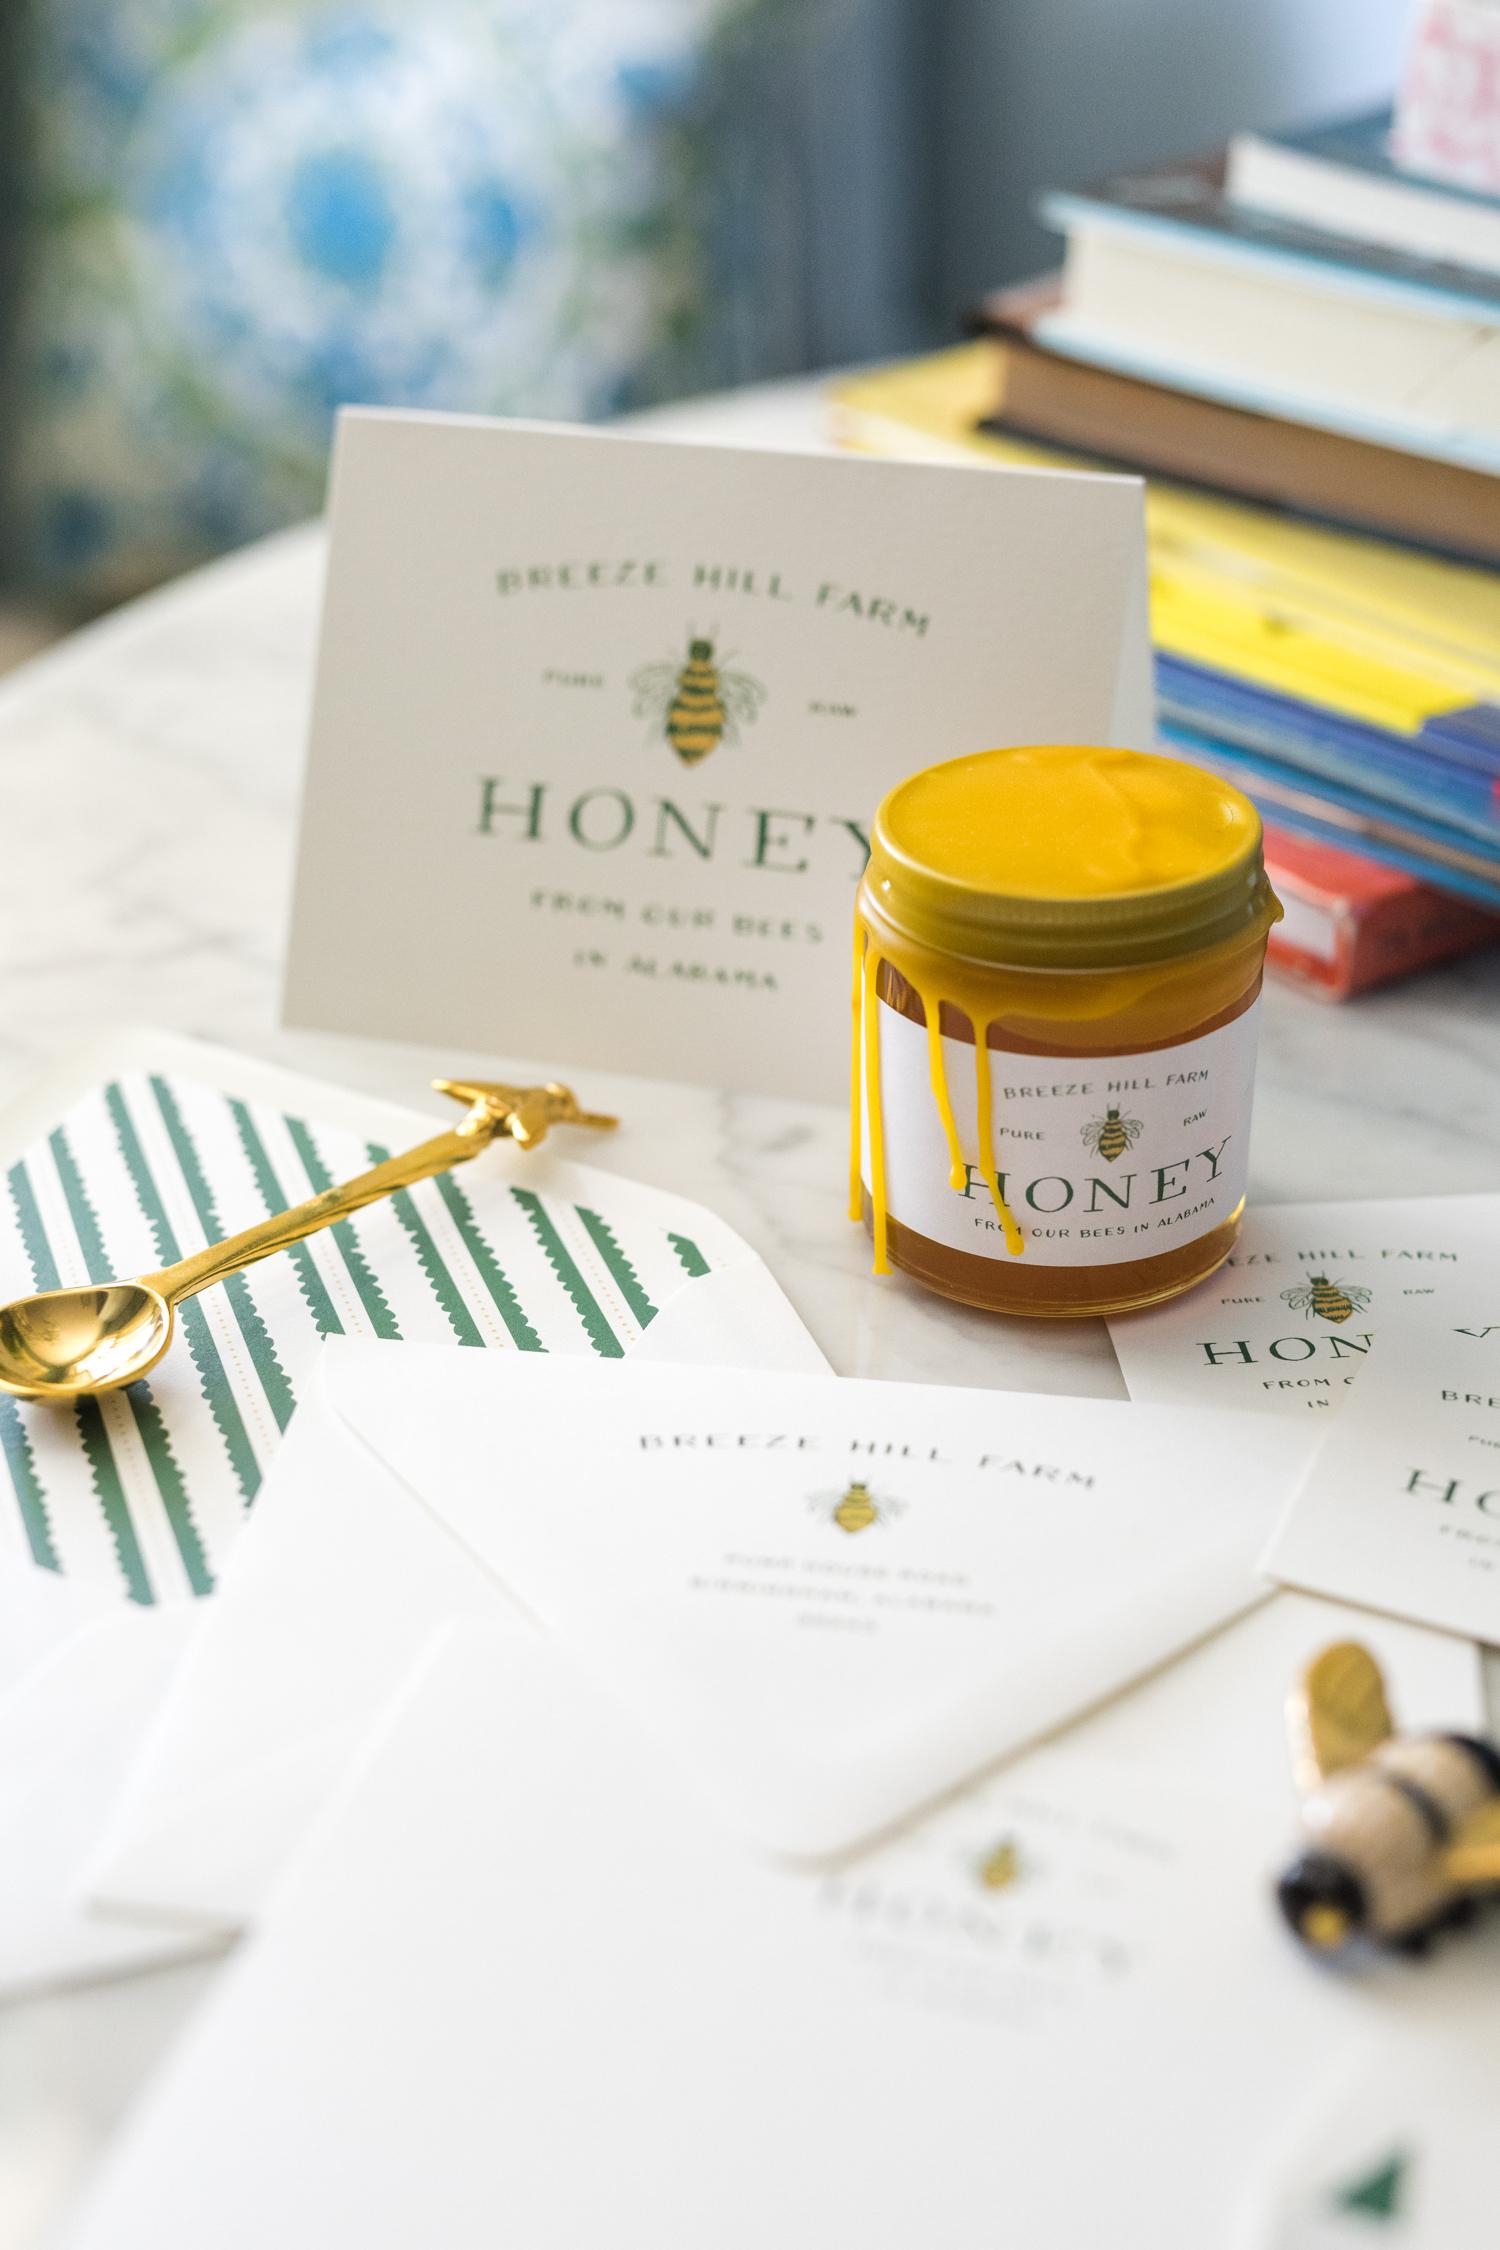 BH Honey web size-431A1005.jpg